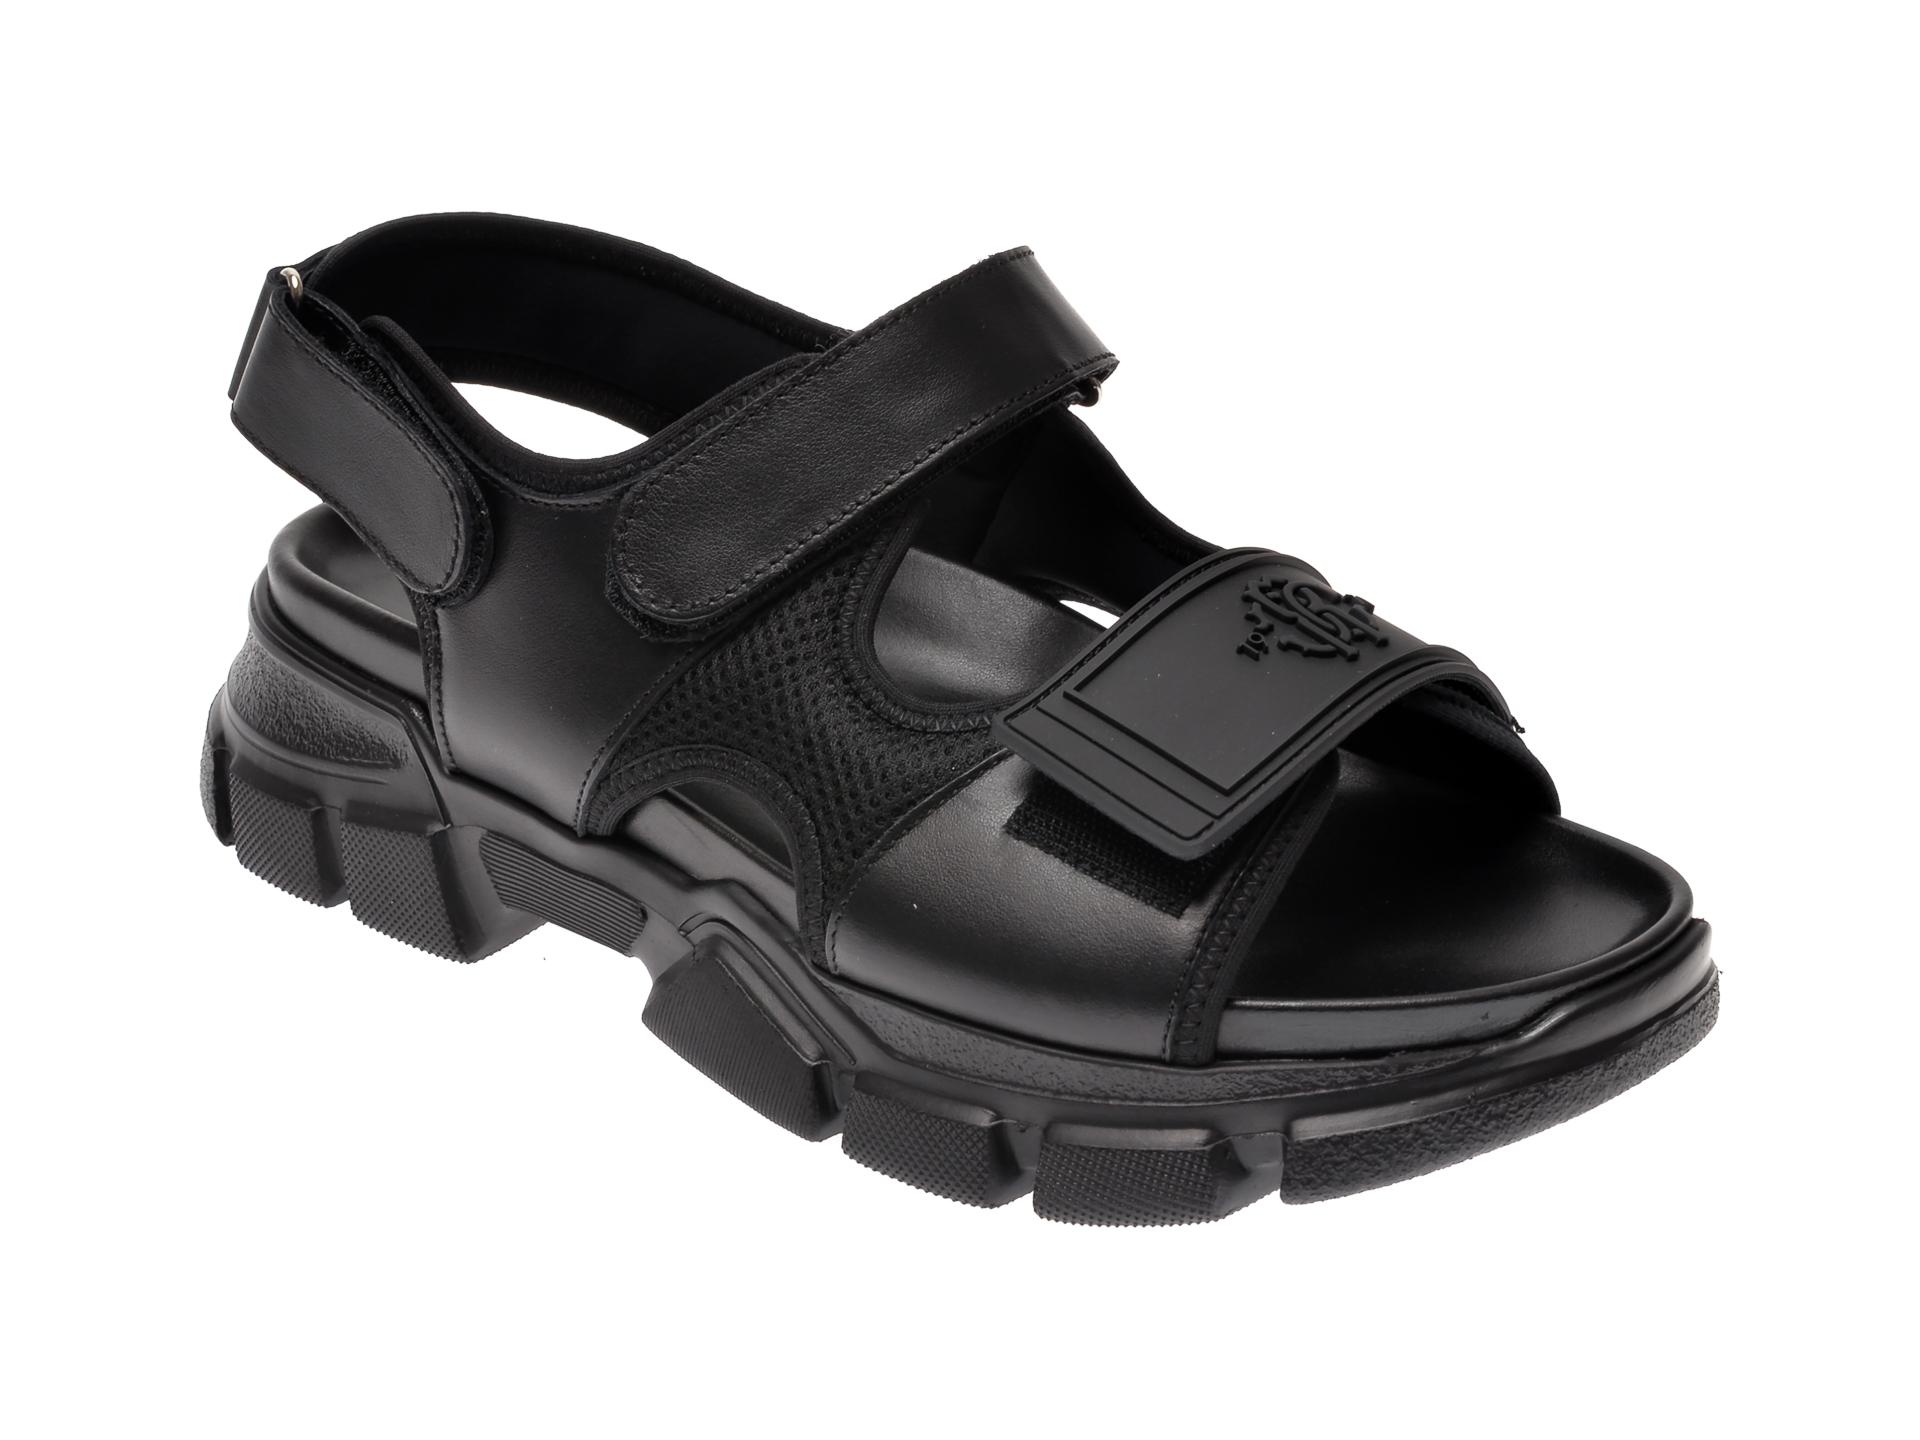 Sandale ROBERTO CAVALLI negre, 100H, din piele naturala imagine